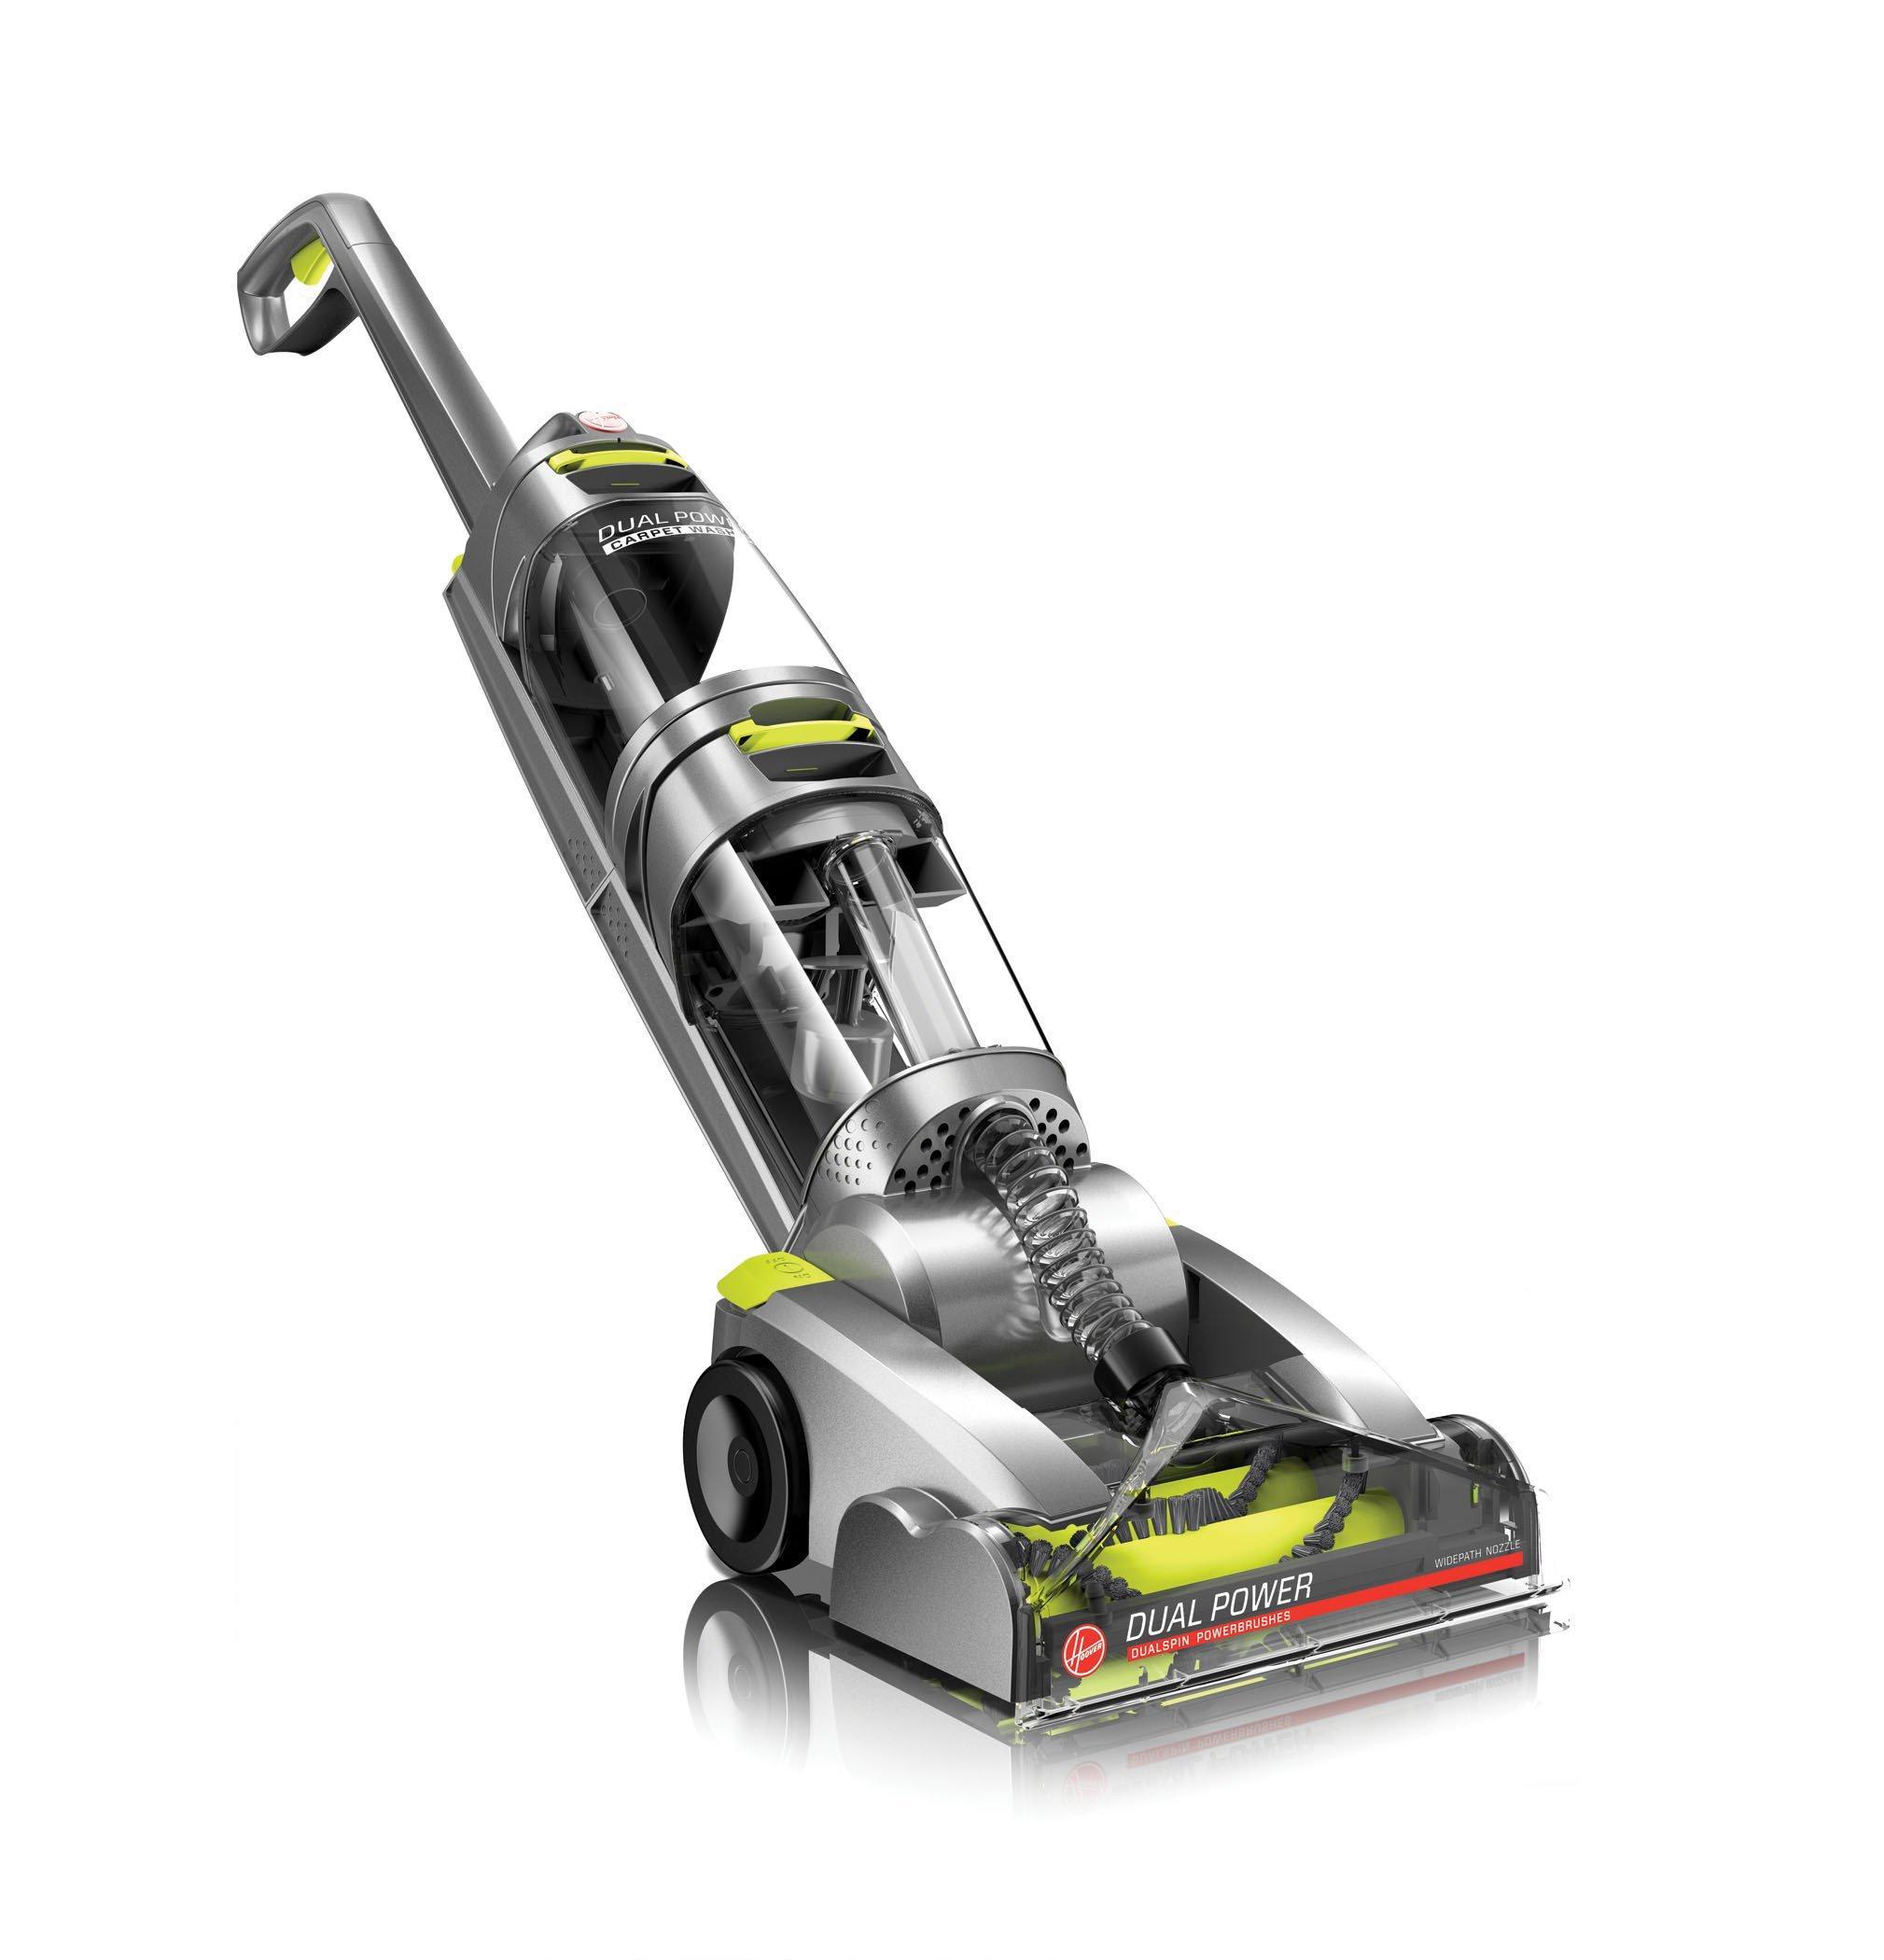 Dual Power Carpet Washer2